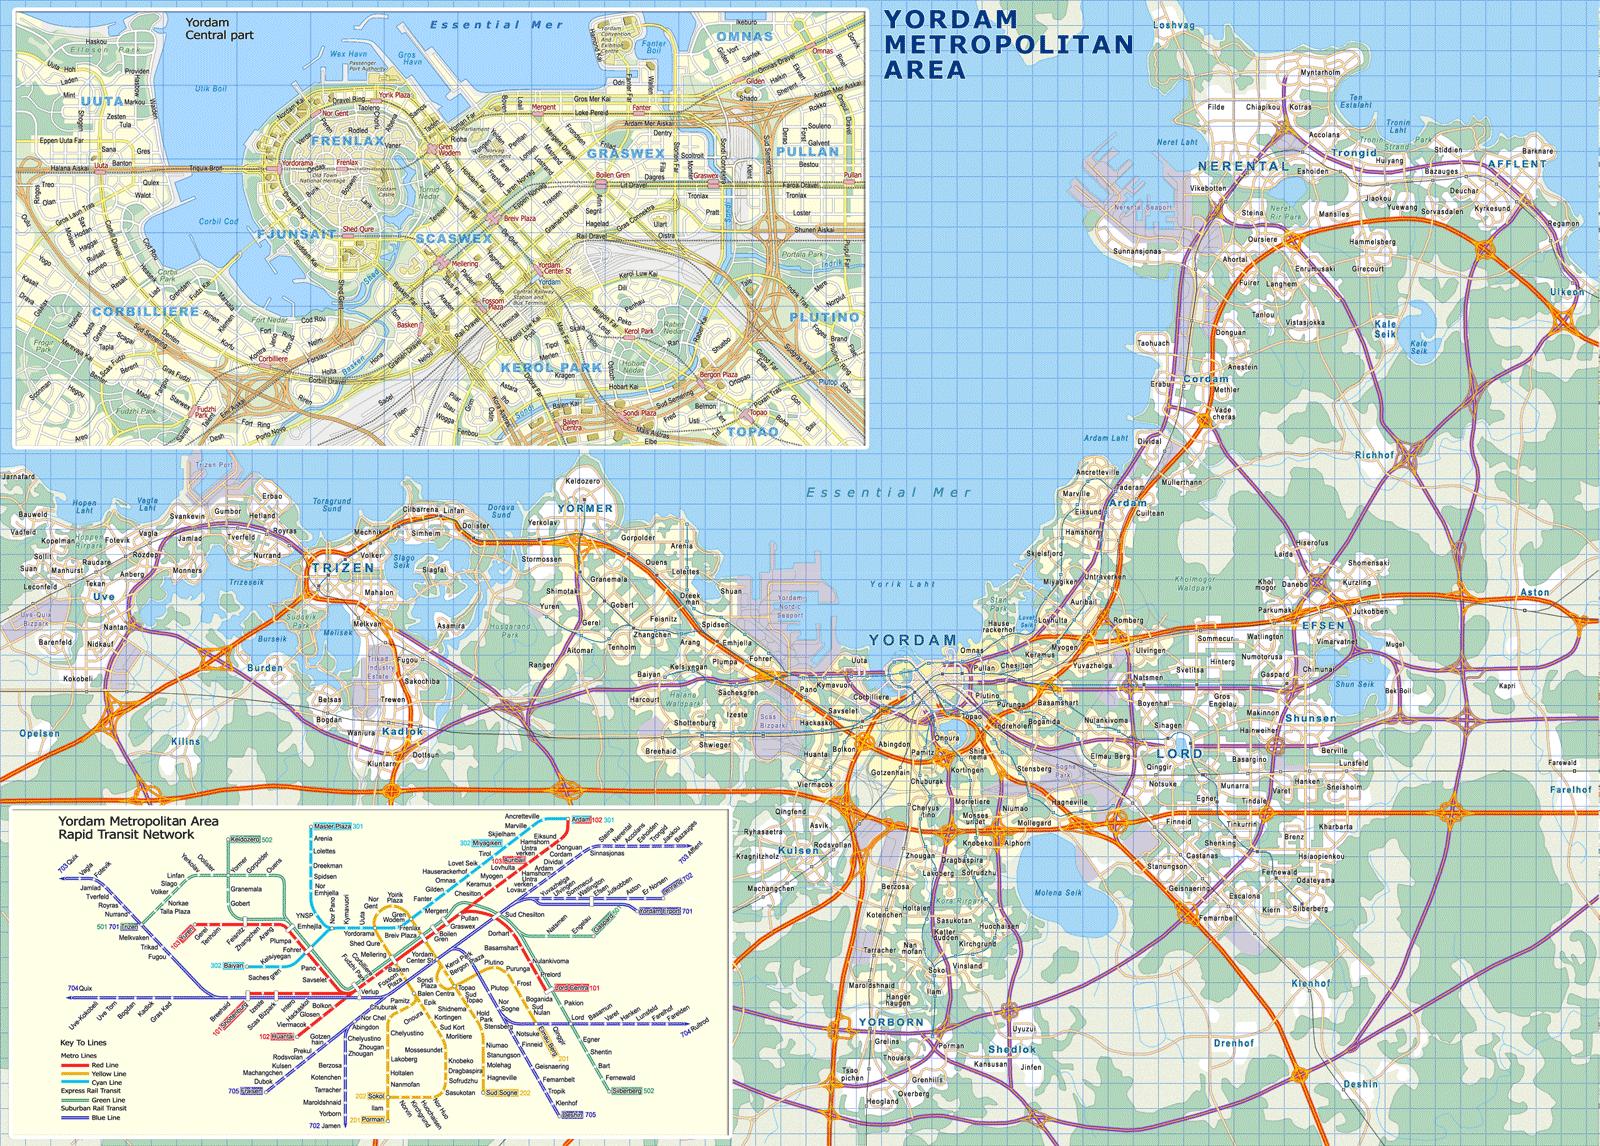 Yordam map